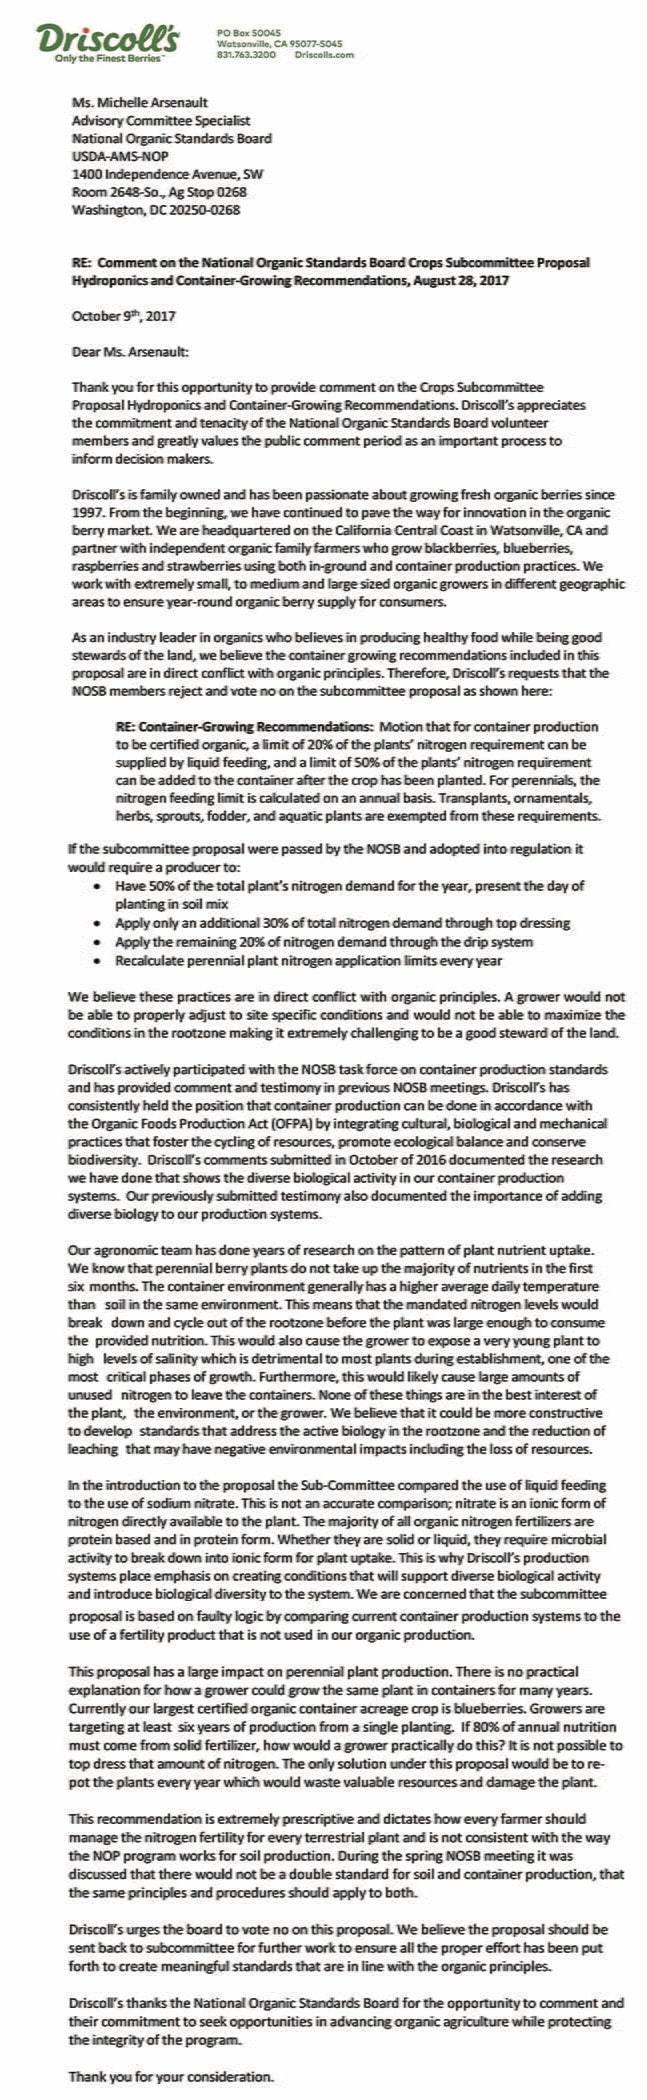 Driscoll's Fall 2017 NOSB Letter